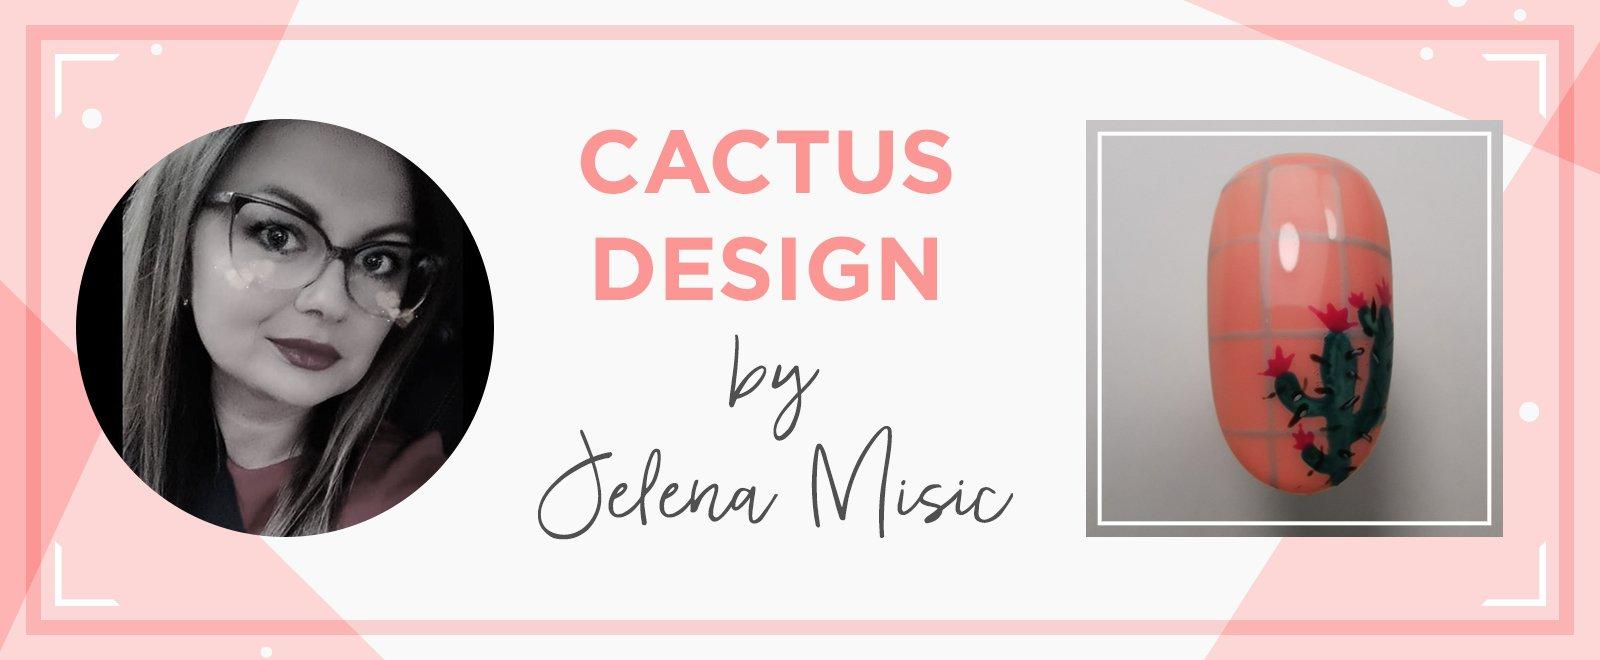 SBS_header_template_1600x660_cactus_Jelena-Misic